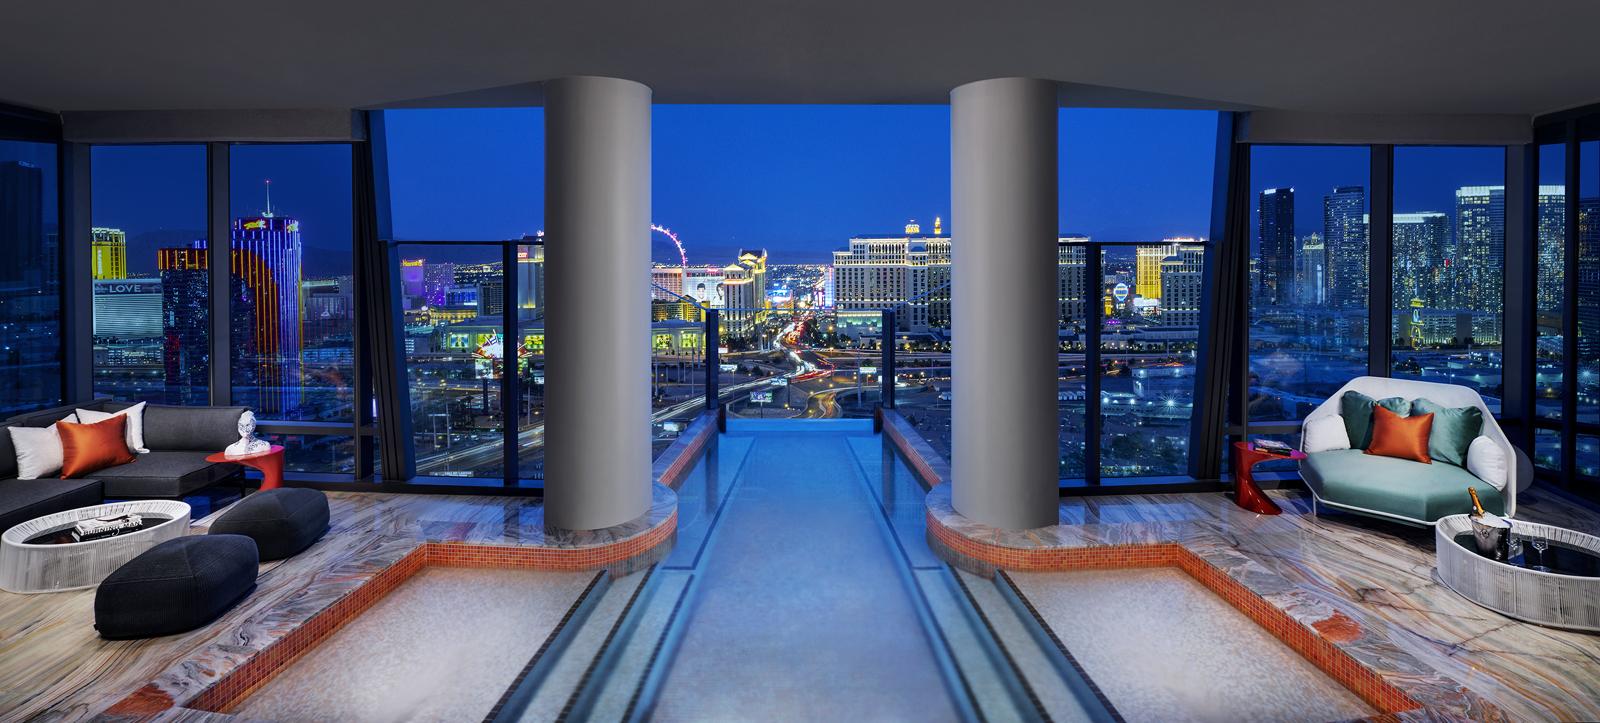 Os Indoor Outdoor Infinity Pool Of A 40k Night Hotel